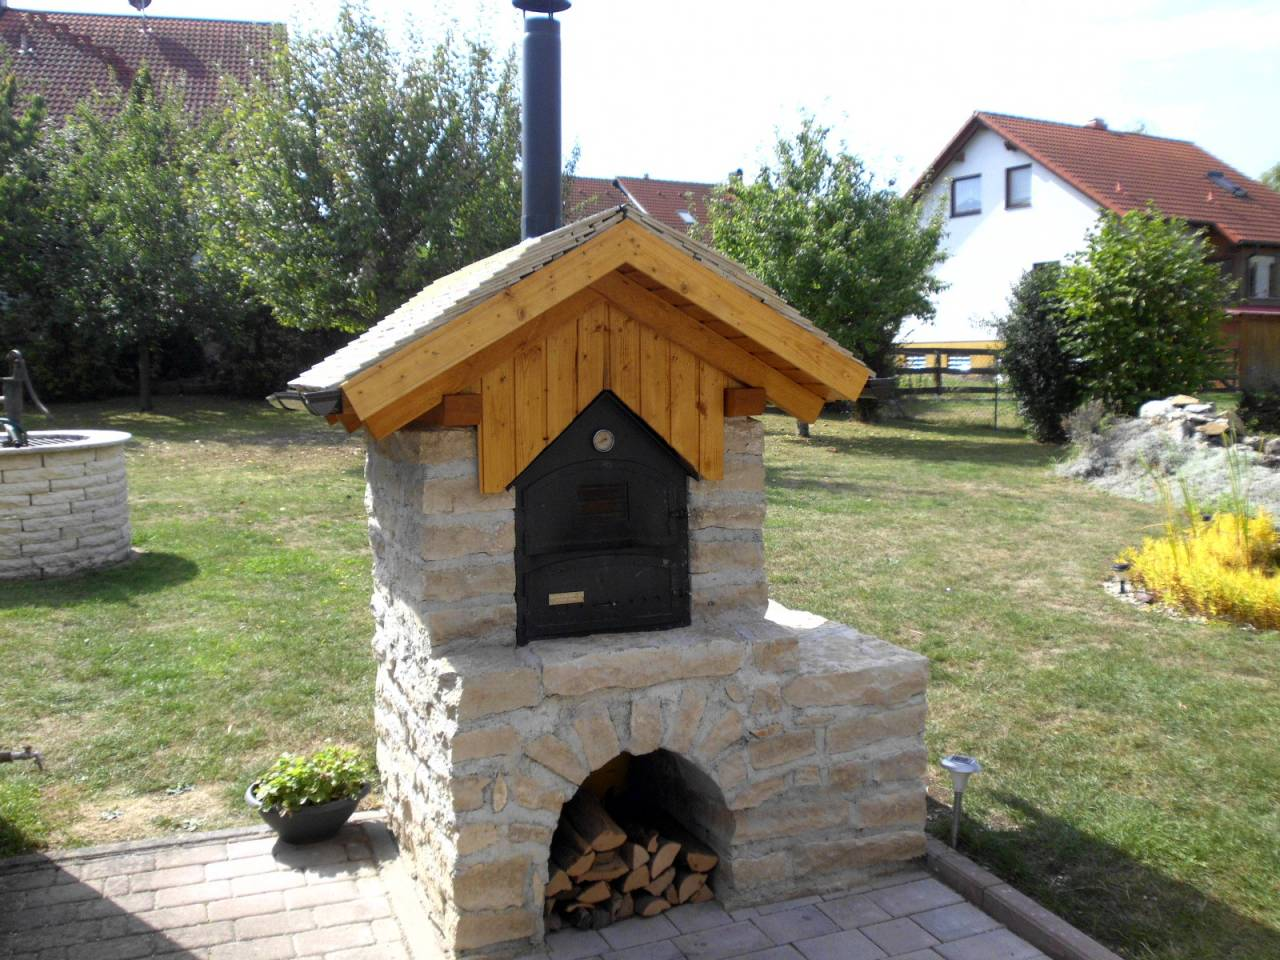 Outdoorküche Weber Xxl : Outdoorküche mit holzbackofen backhaus mit fontana forni holzbackofen